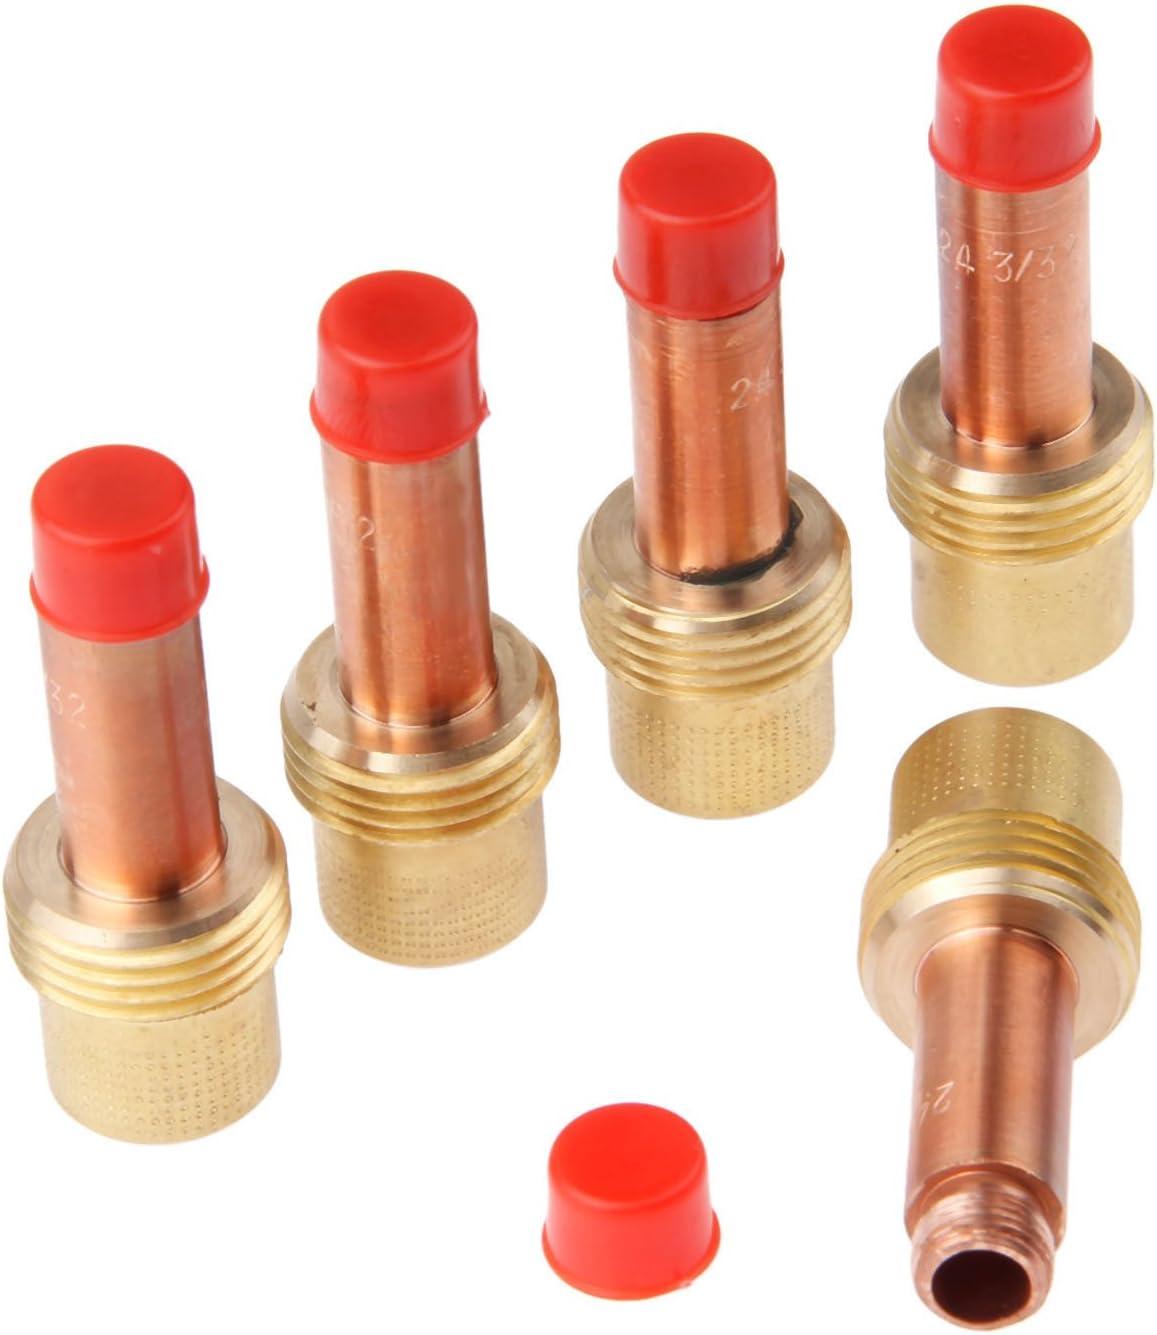 10 pcs 45V26 Tig Welding Gas Lens Collet Bodies Mtsooning 3//32inch